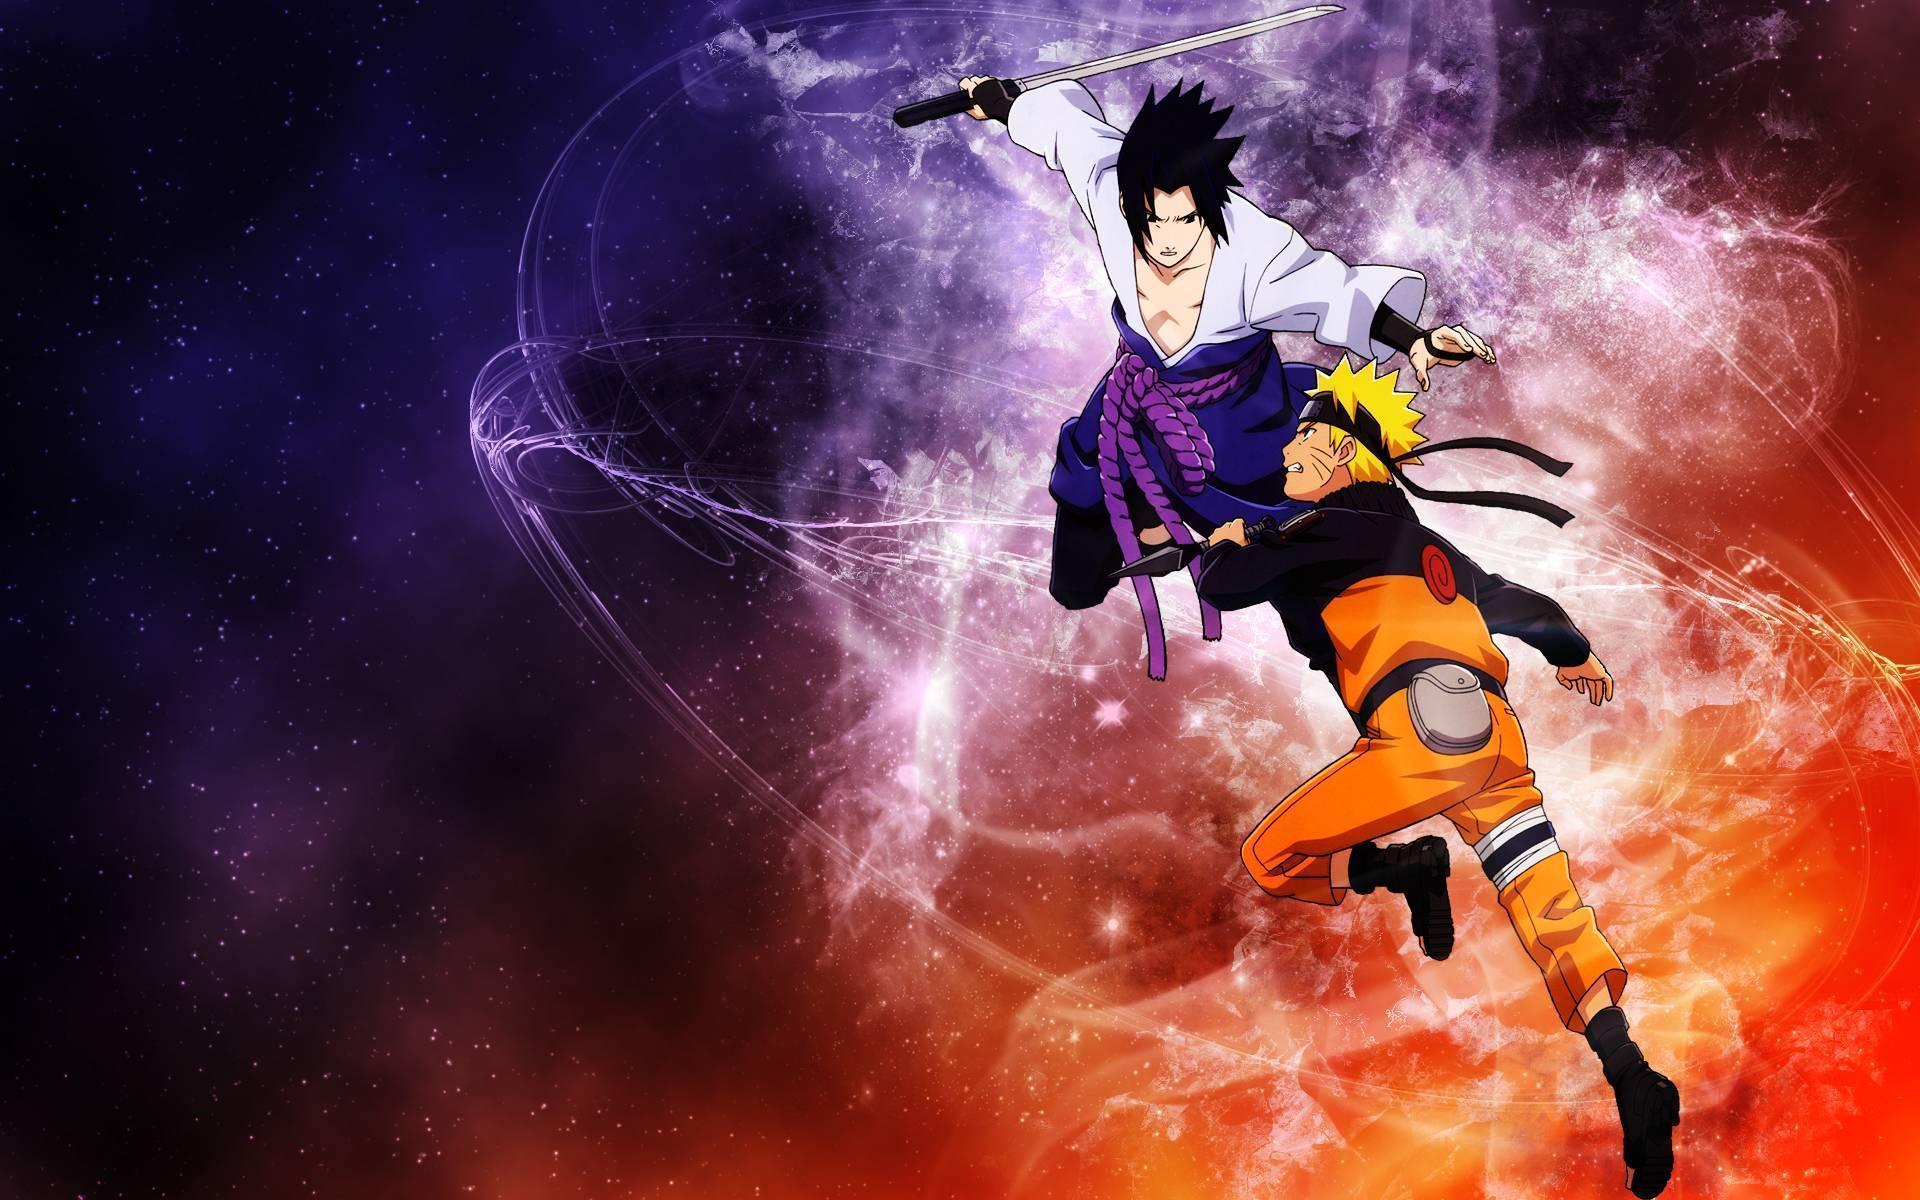 Naruto Shippuden Wallpaper Celular: Wallpapers Naruto Shippuden HD 2016